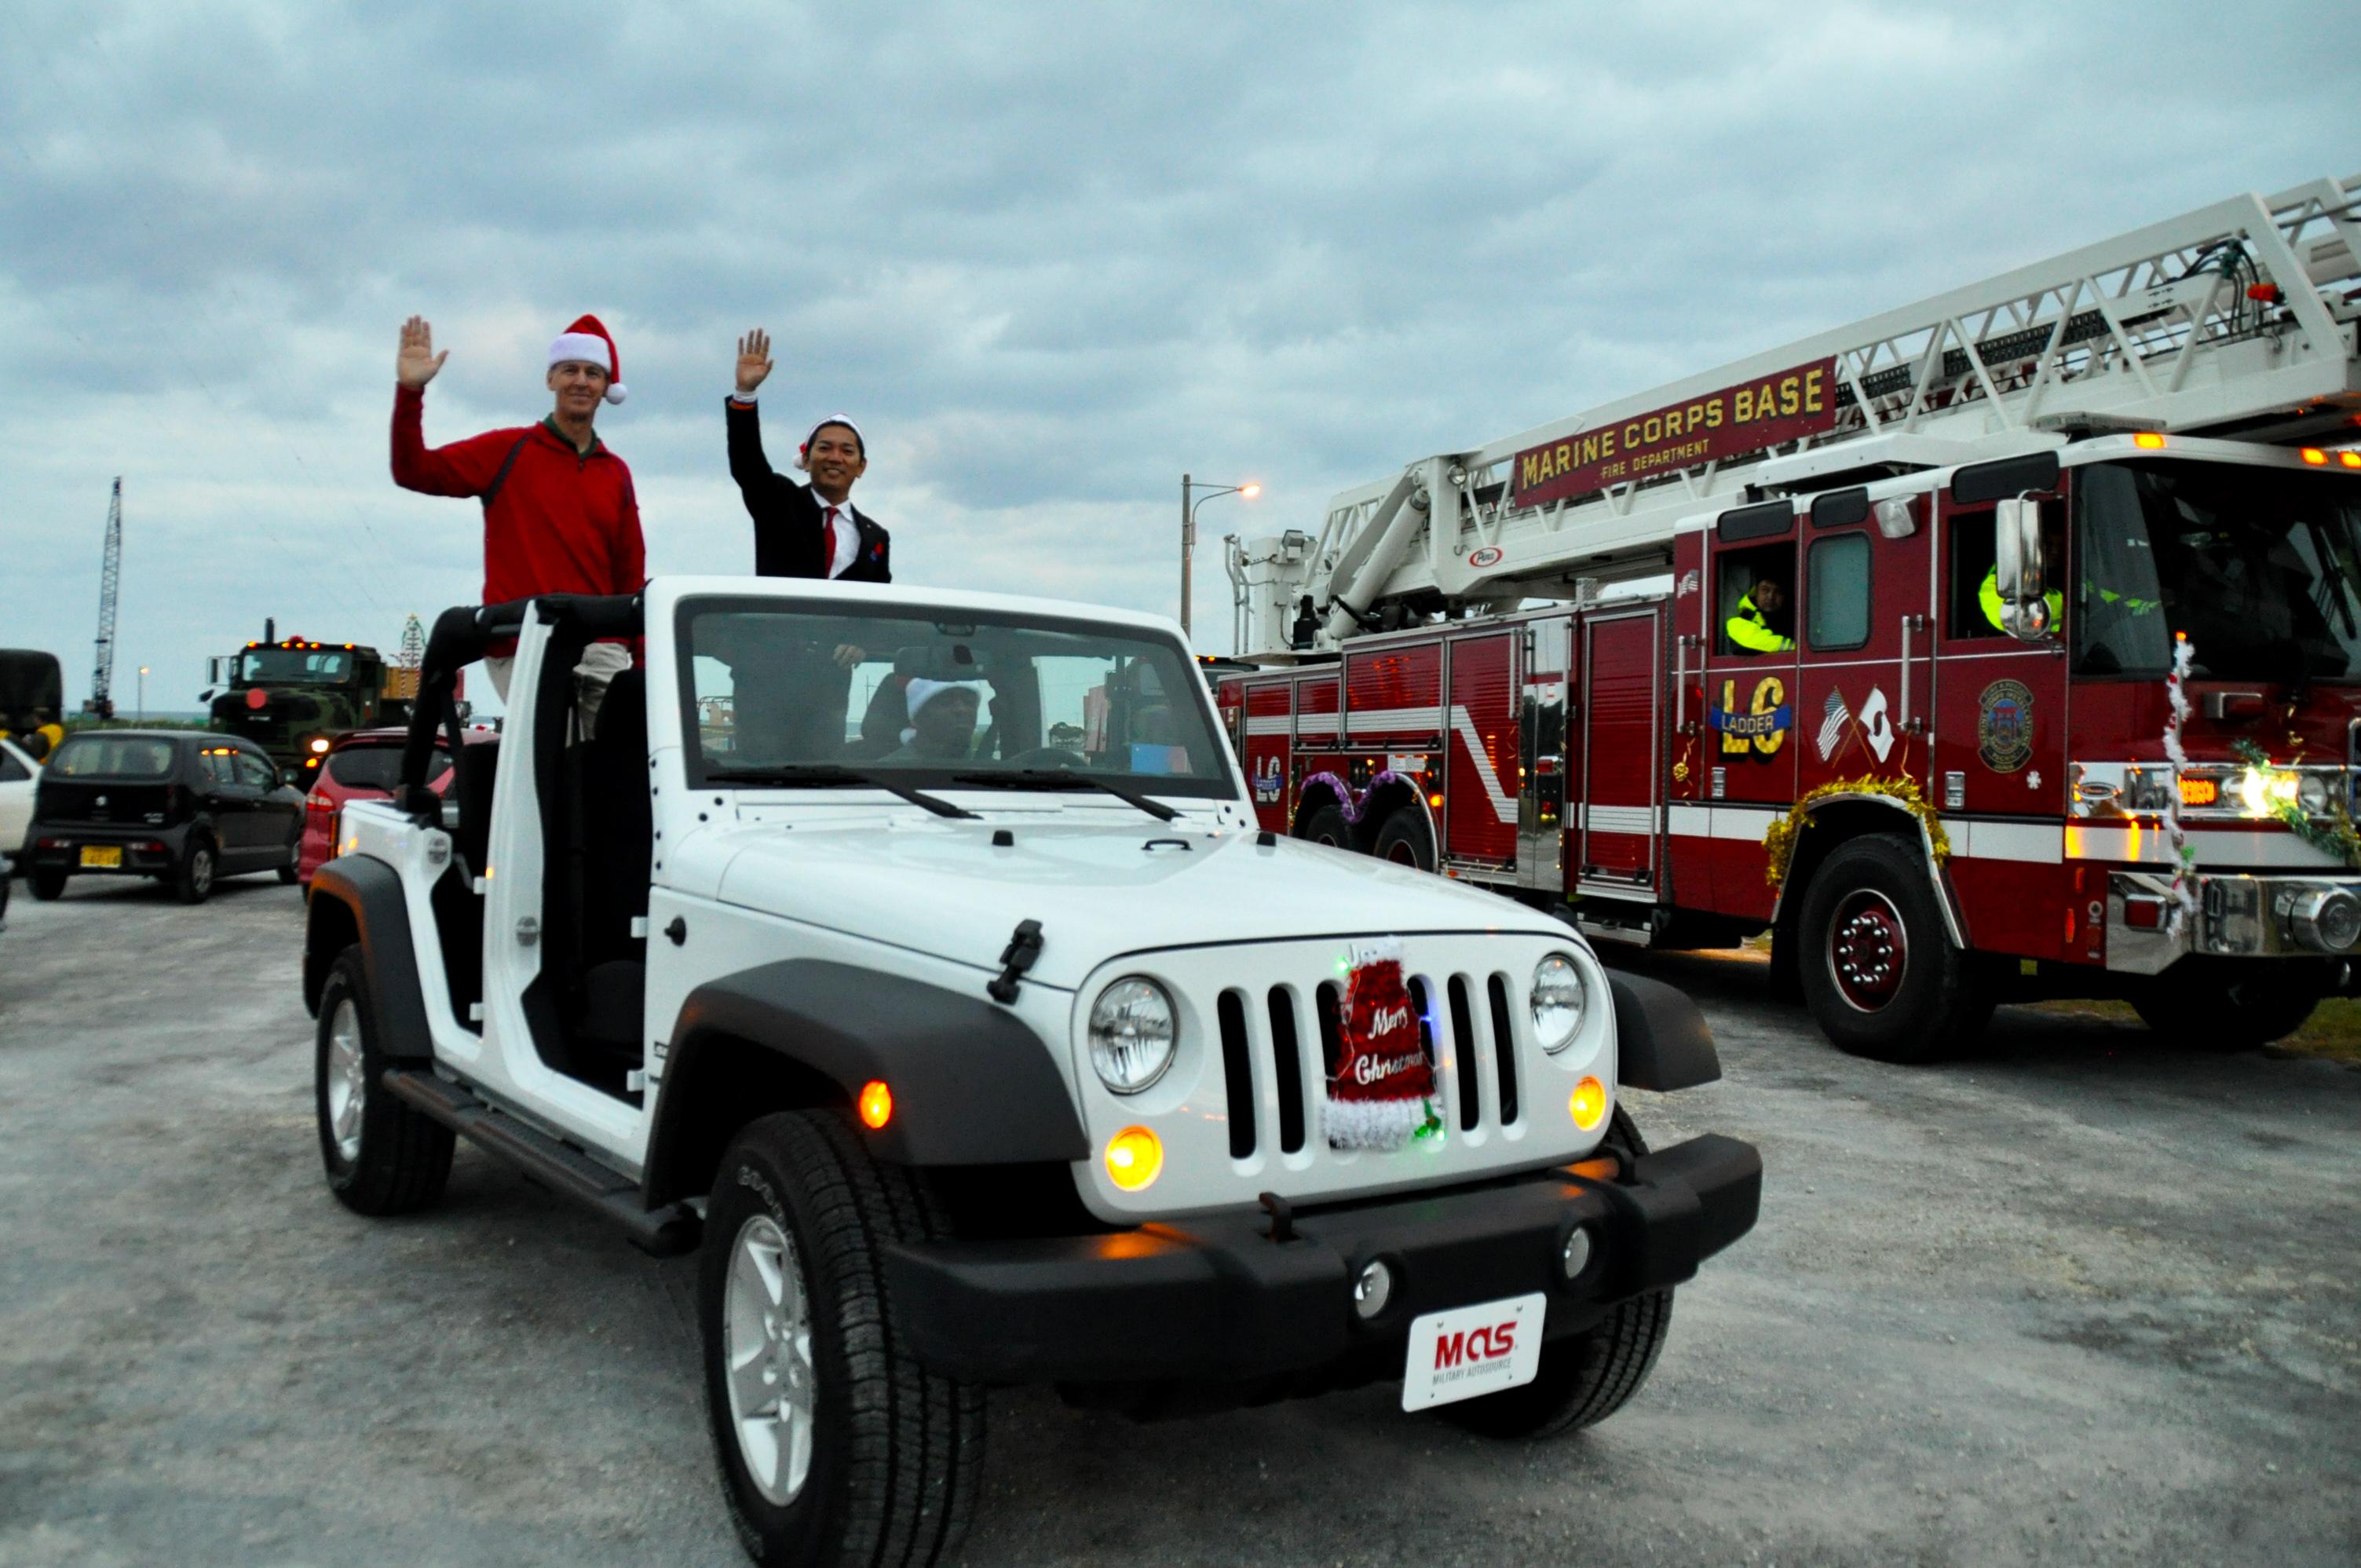 Marine Corps Installations Pacific Brings Holiday Spirit to Okinawa